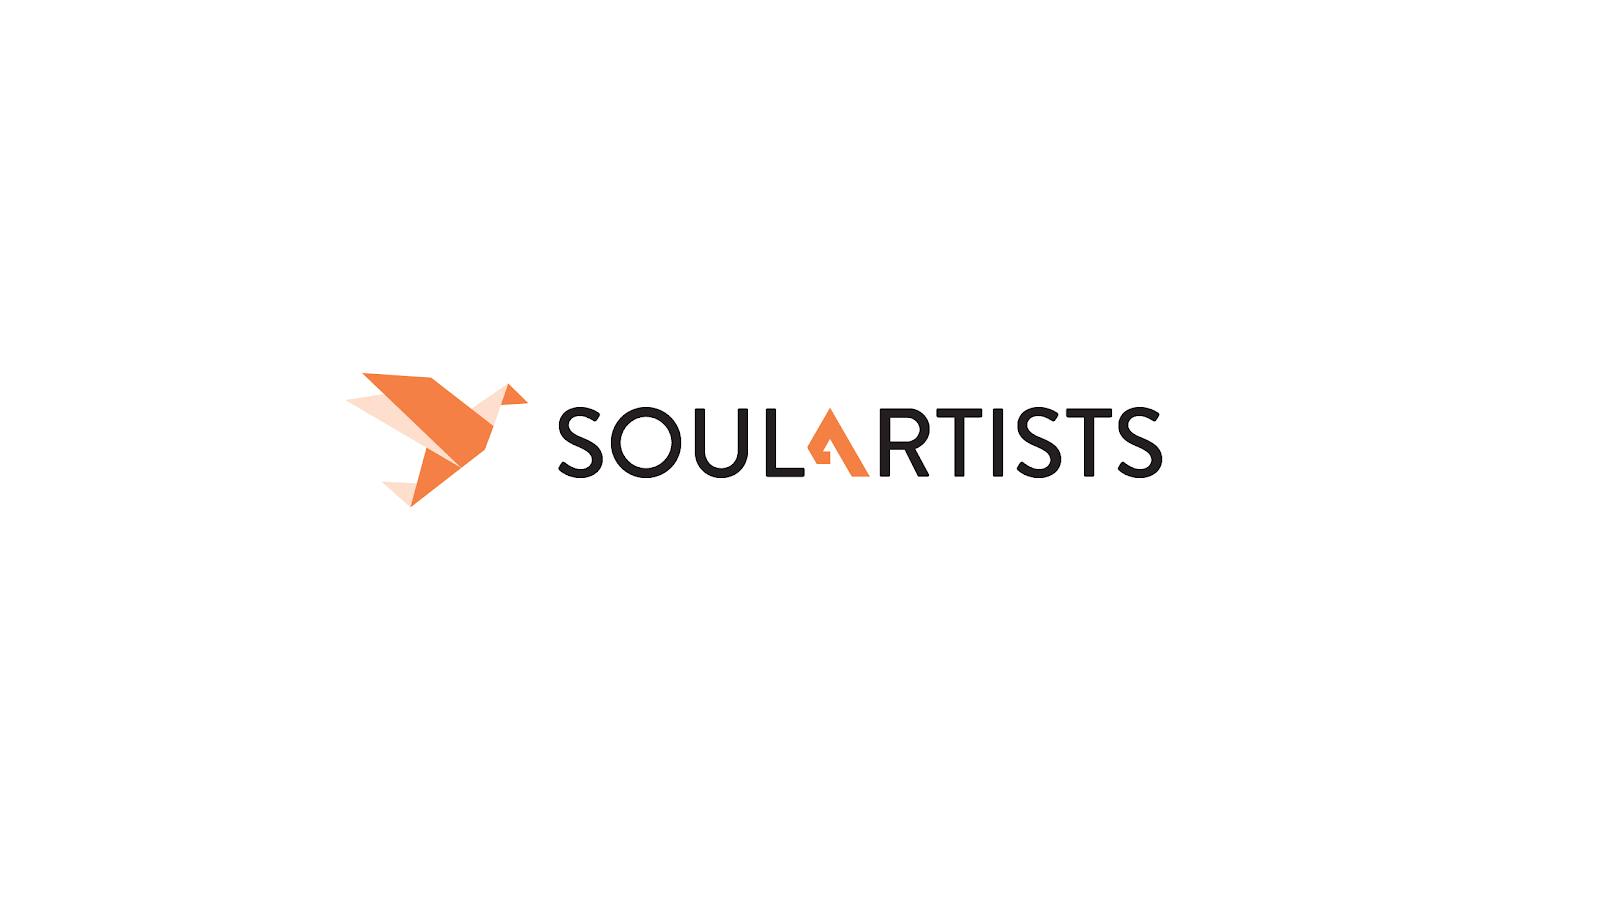 soul-artists-raises-usd-350k-bridge-funding